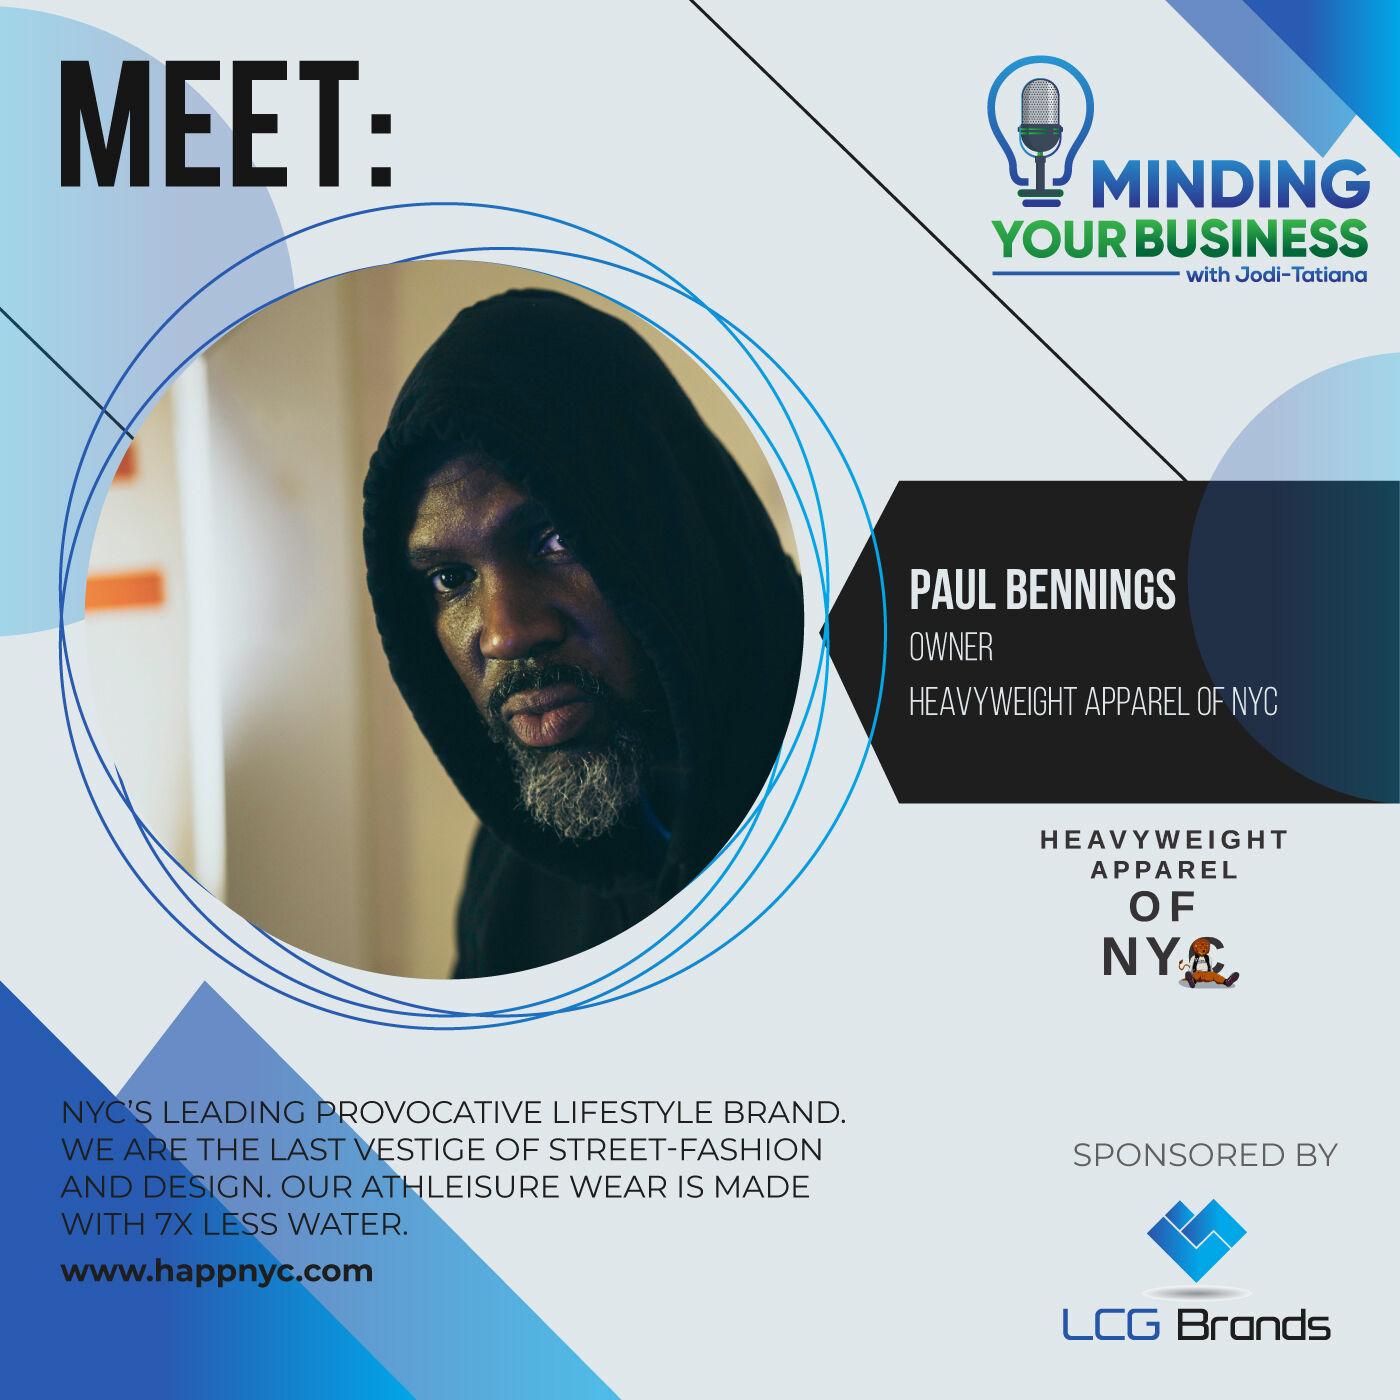 Episode 114: Meet Heavyweight Apparel of NYC owner, Paul Bennings (New York/Las Vegas-USA)